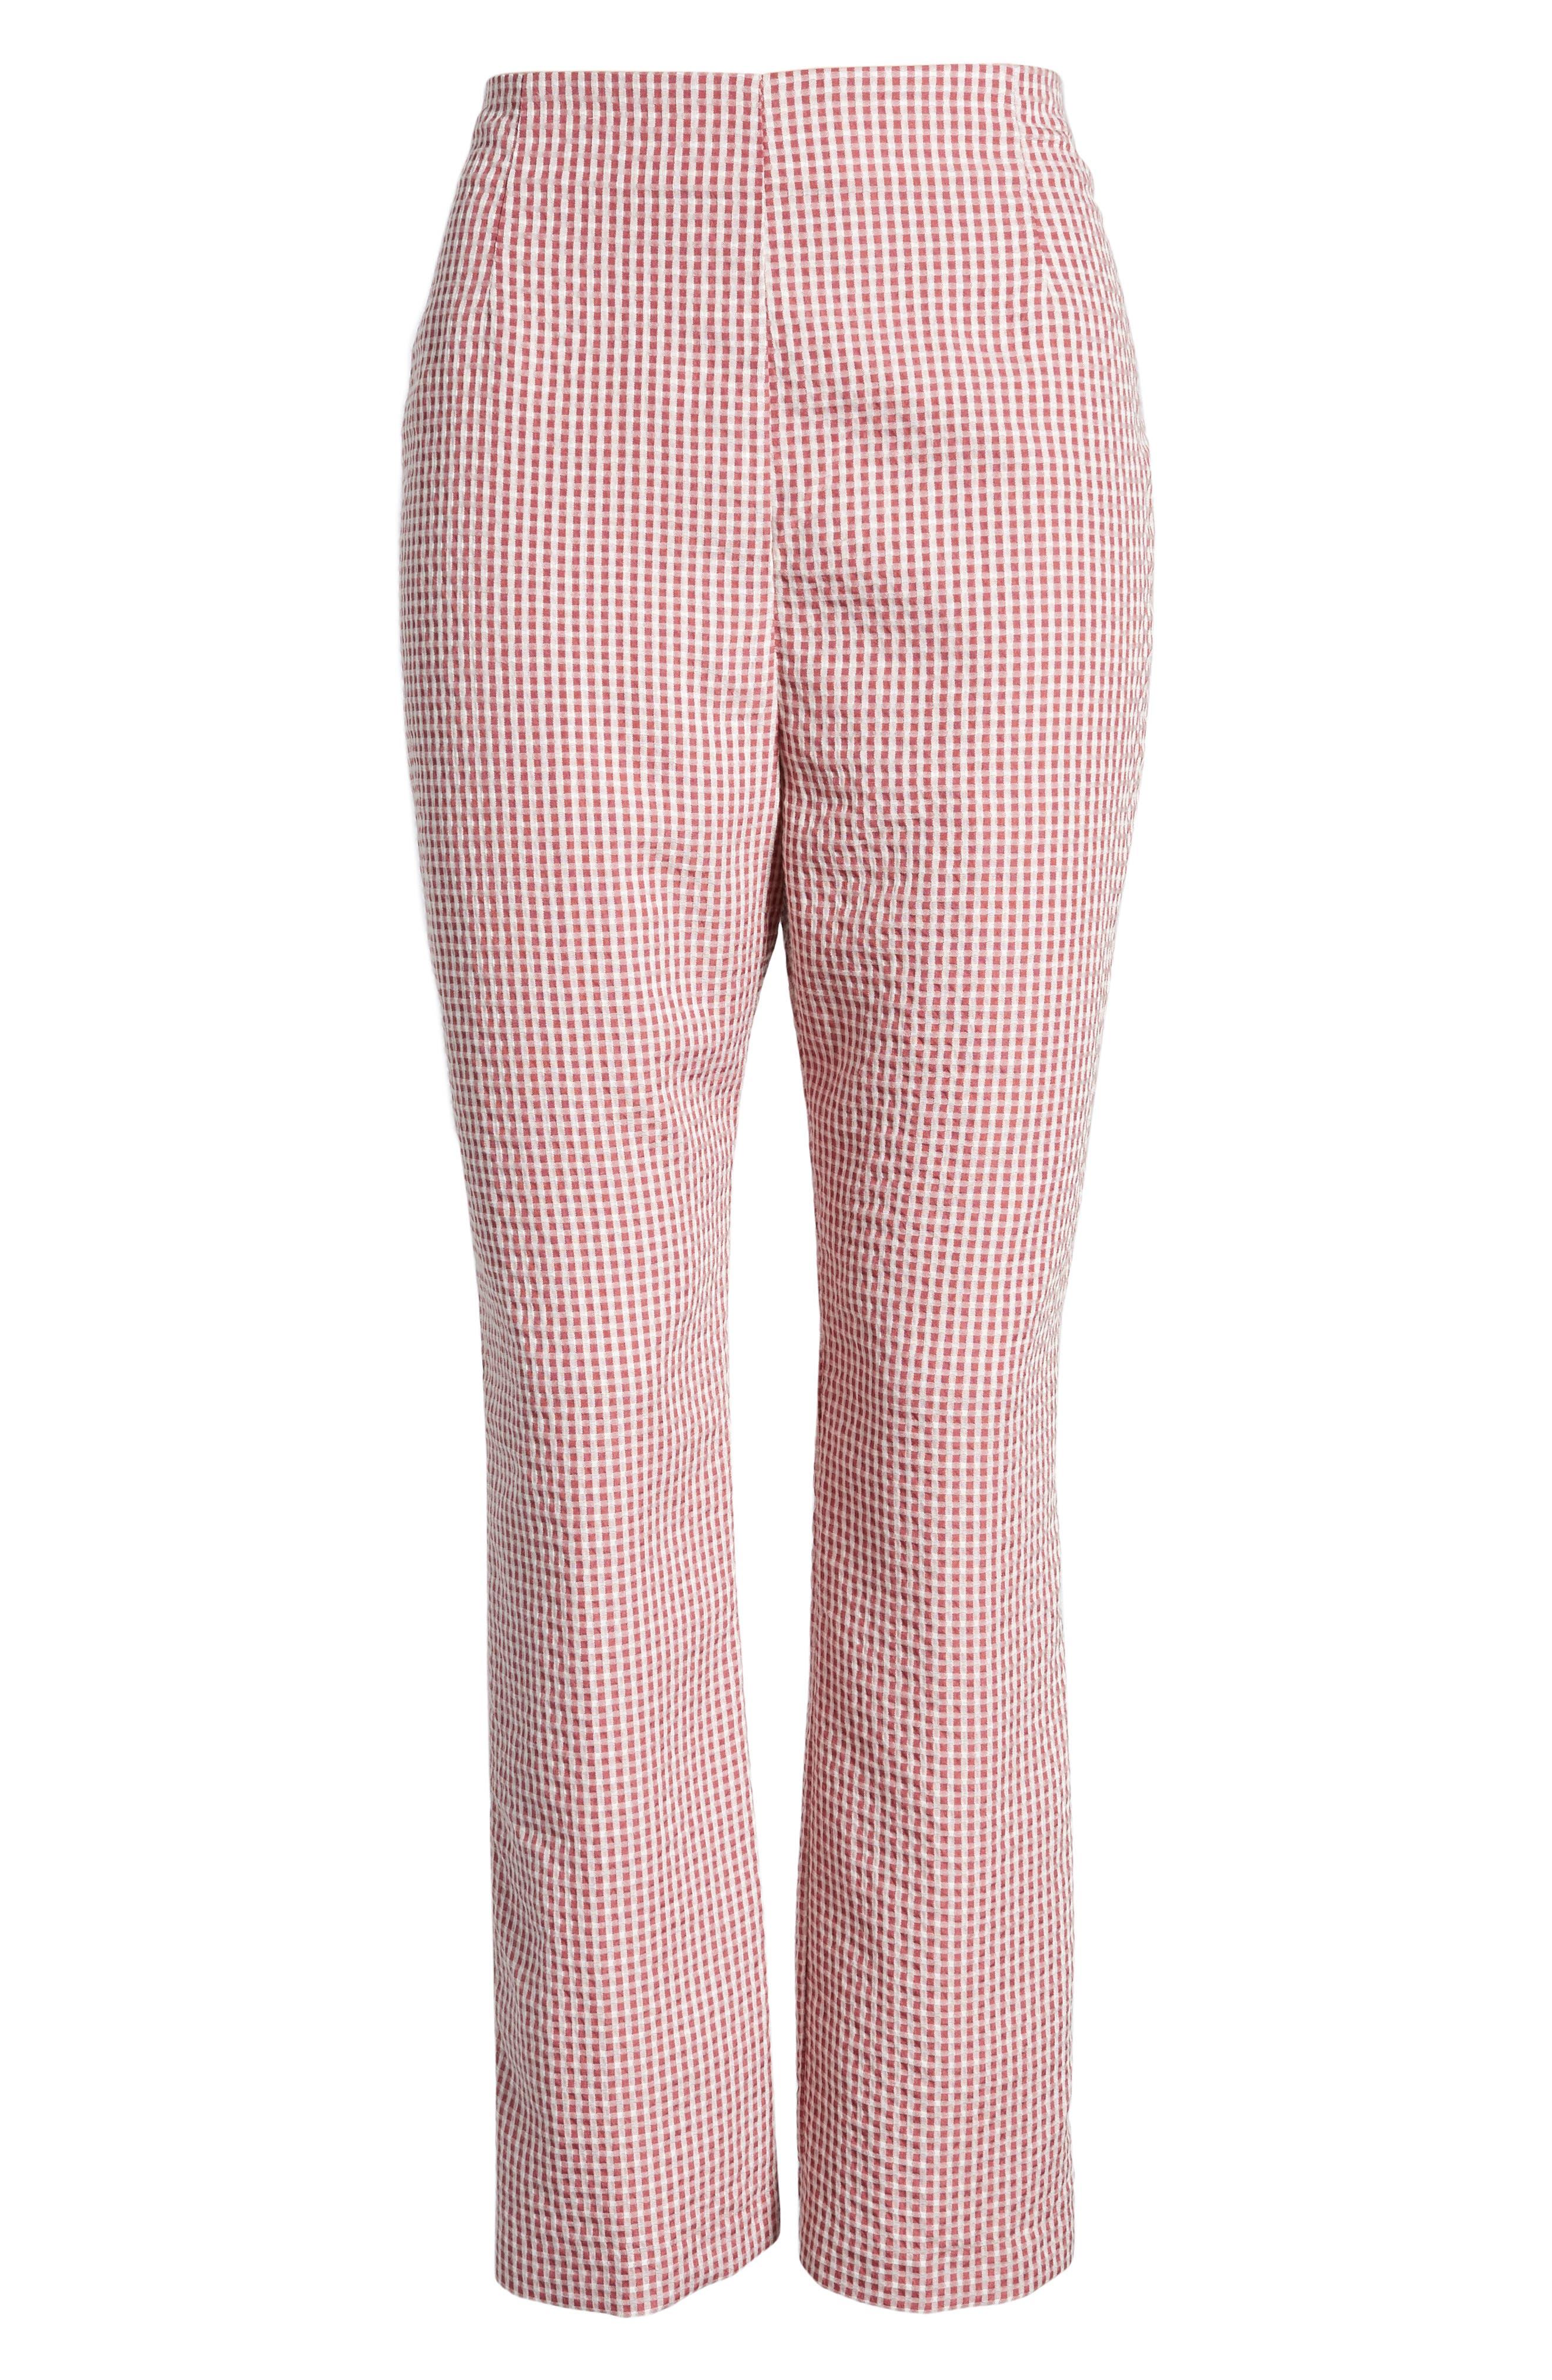 Pisa High Waist Crop Pants,                             Alternate thumbnail 7, color,                             RED GINGHAM